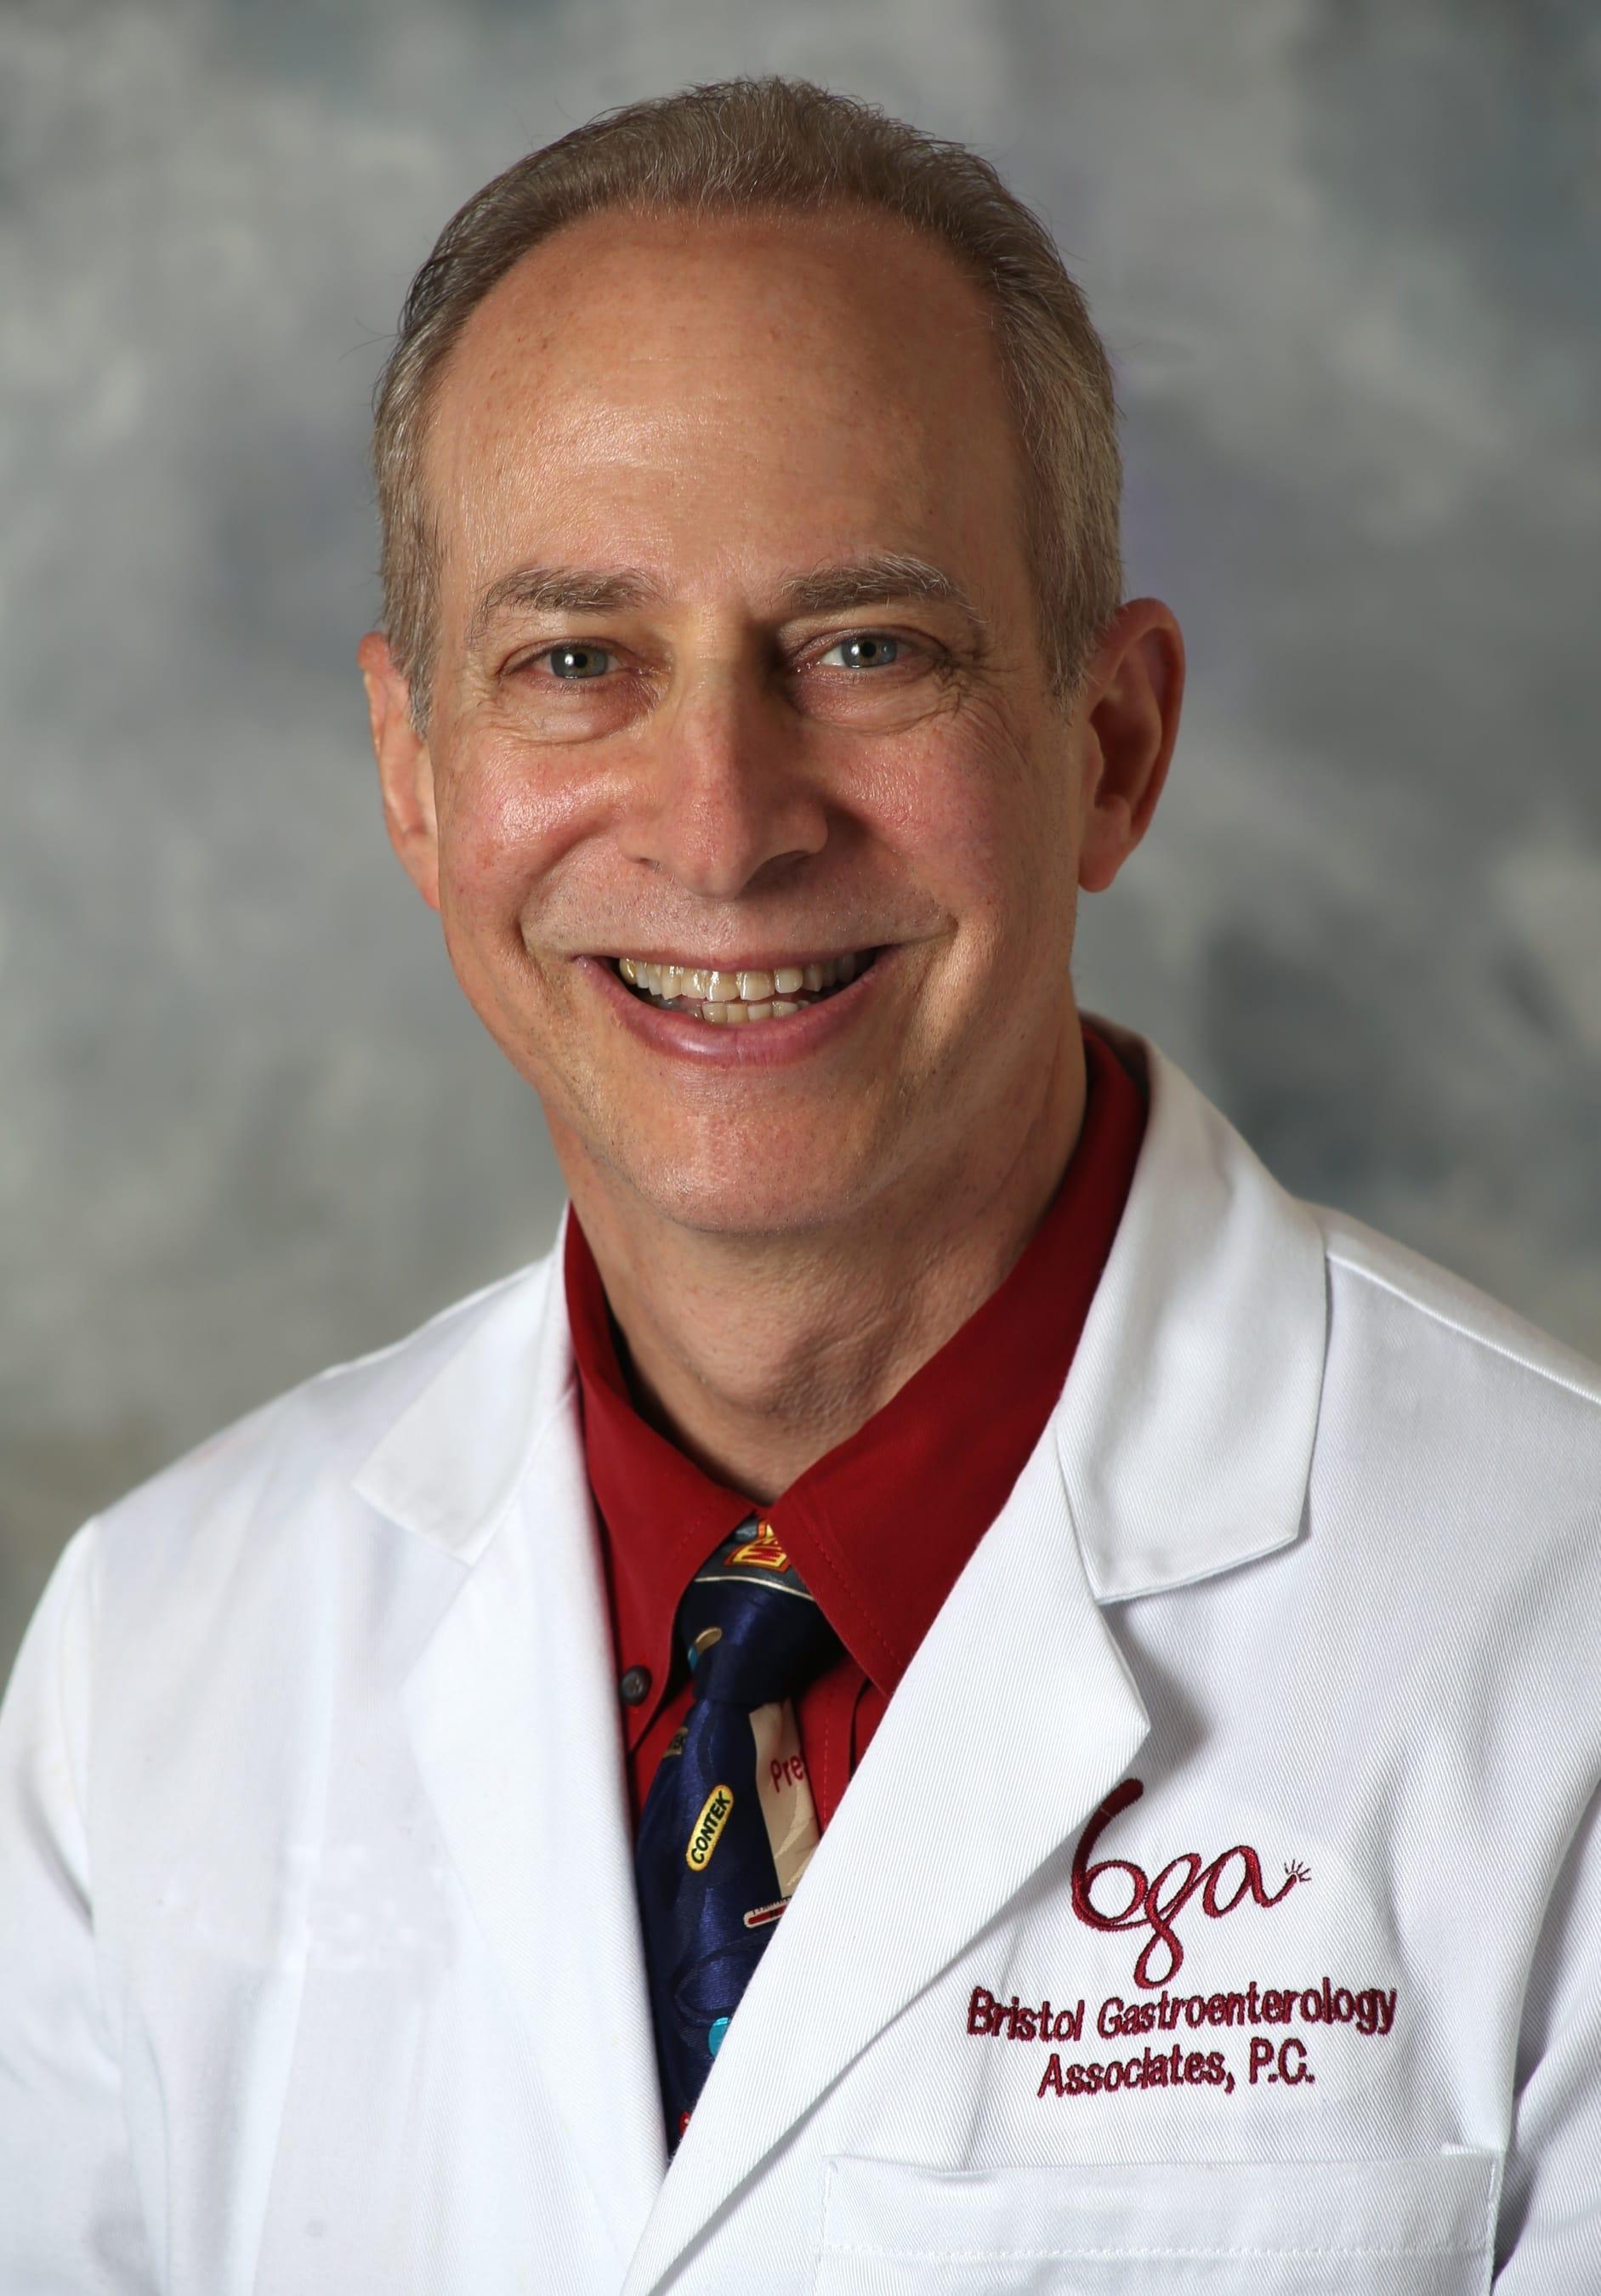 Daniel Smiley, Connecticut GI - Gastroenterology Doctor in